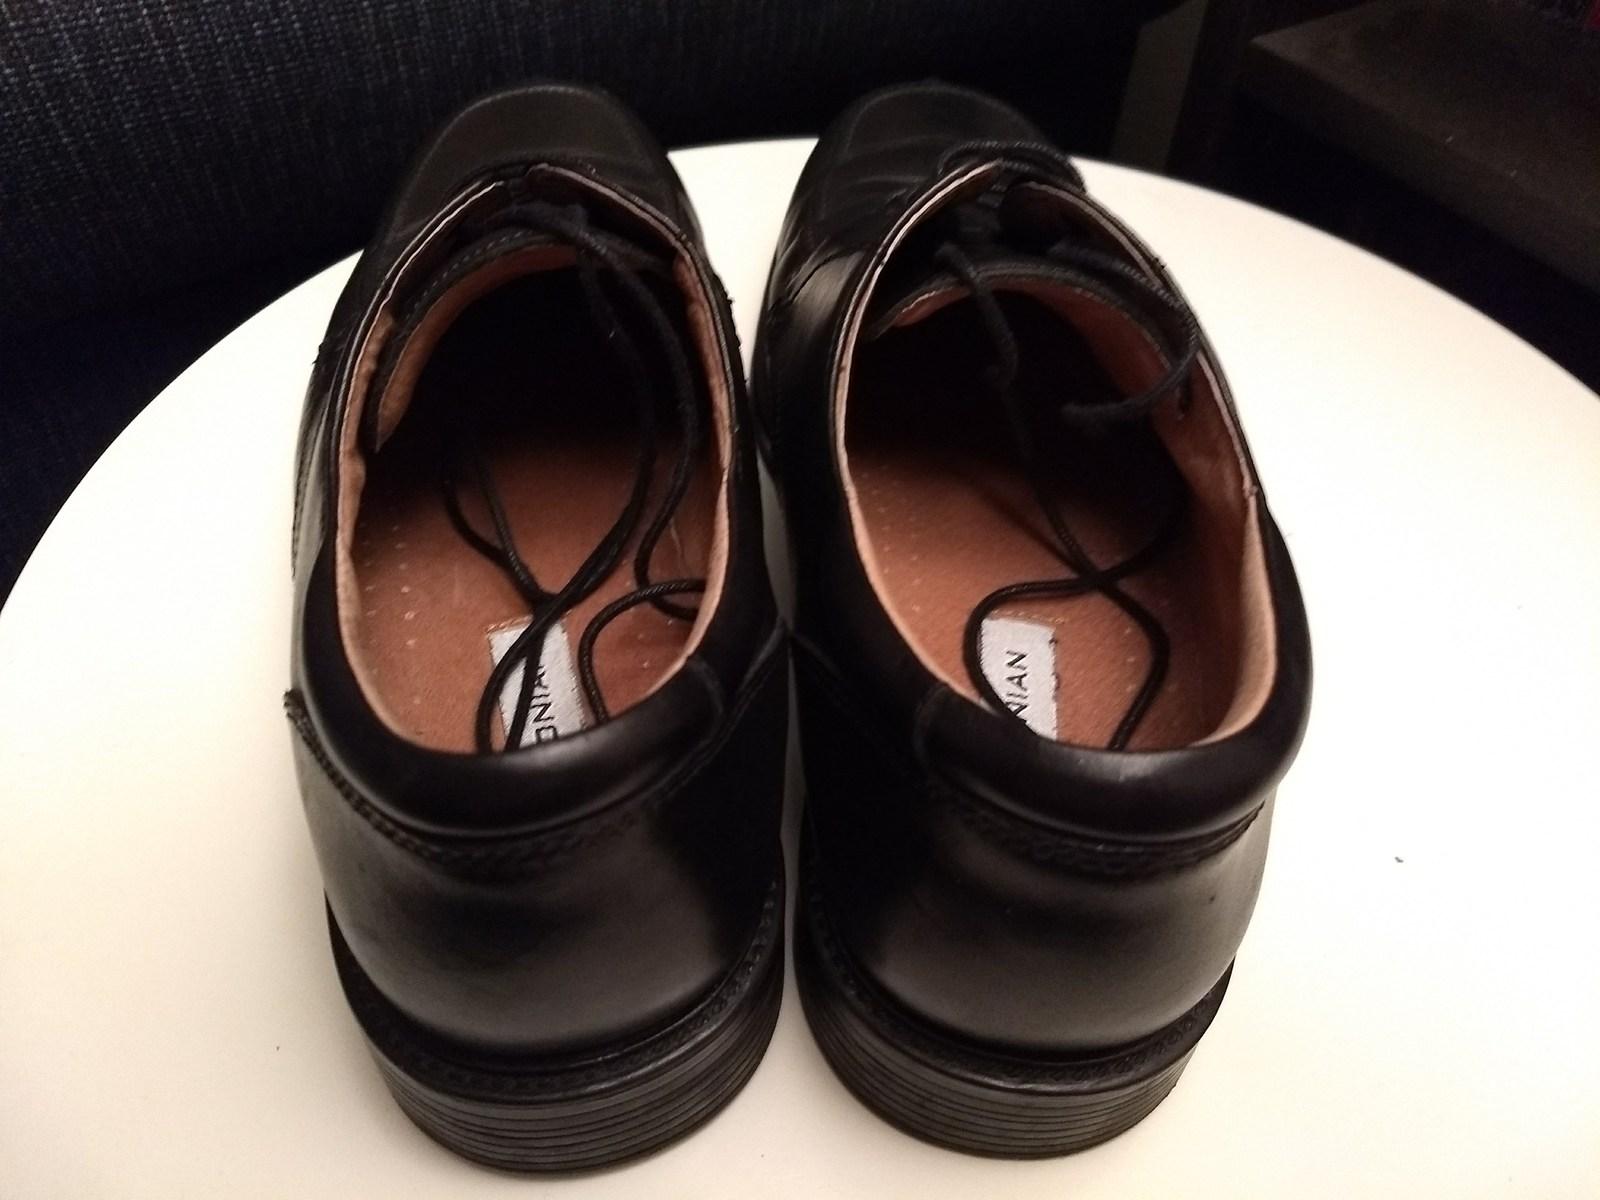 Bostonian Men's Leather Upper Shoes US 10W